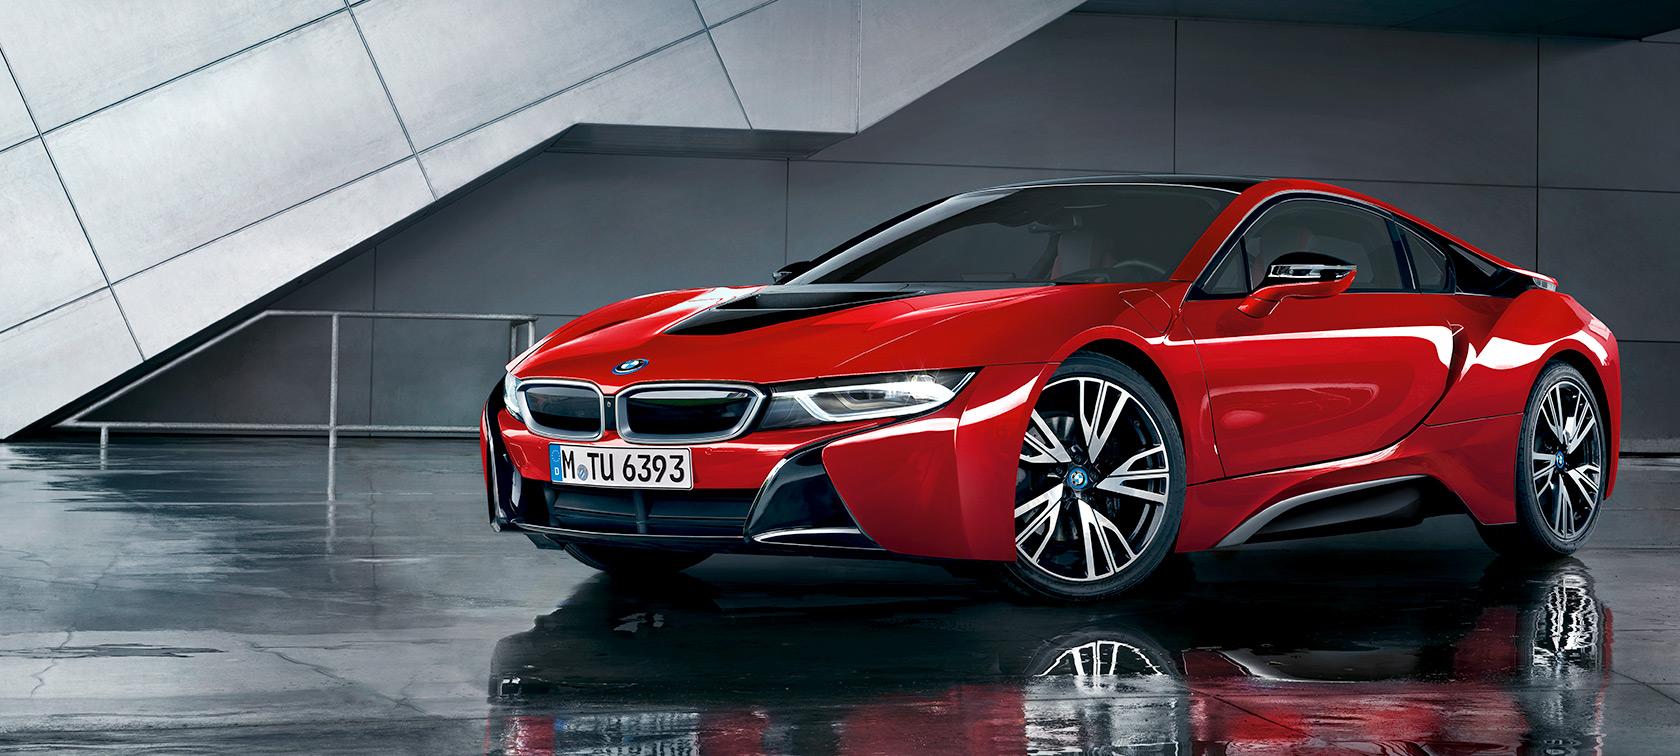 Bmw I Series Bmw I8 Protonic Red Edition